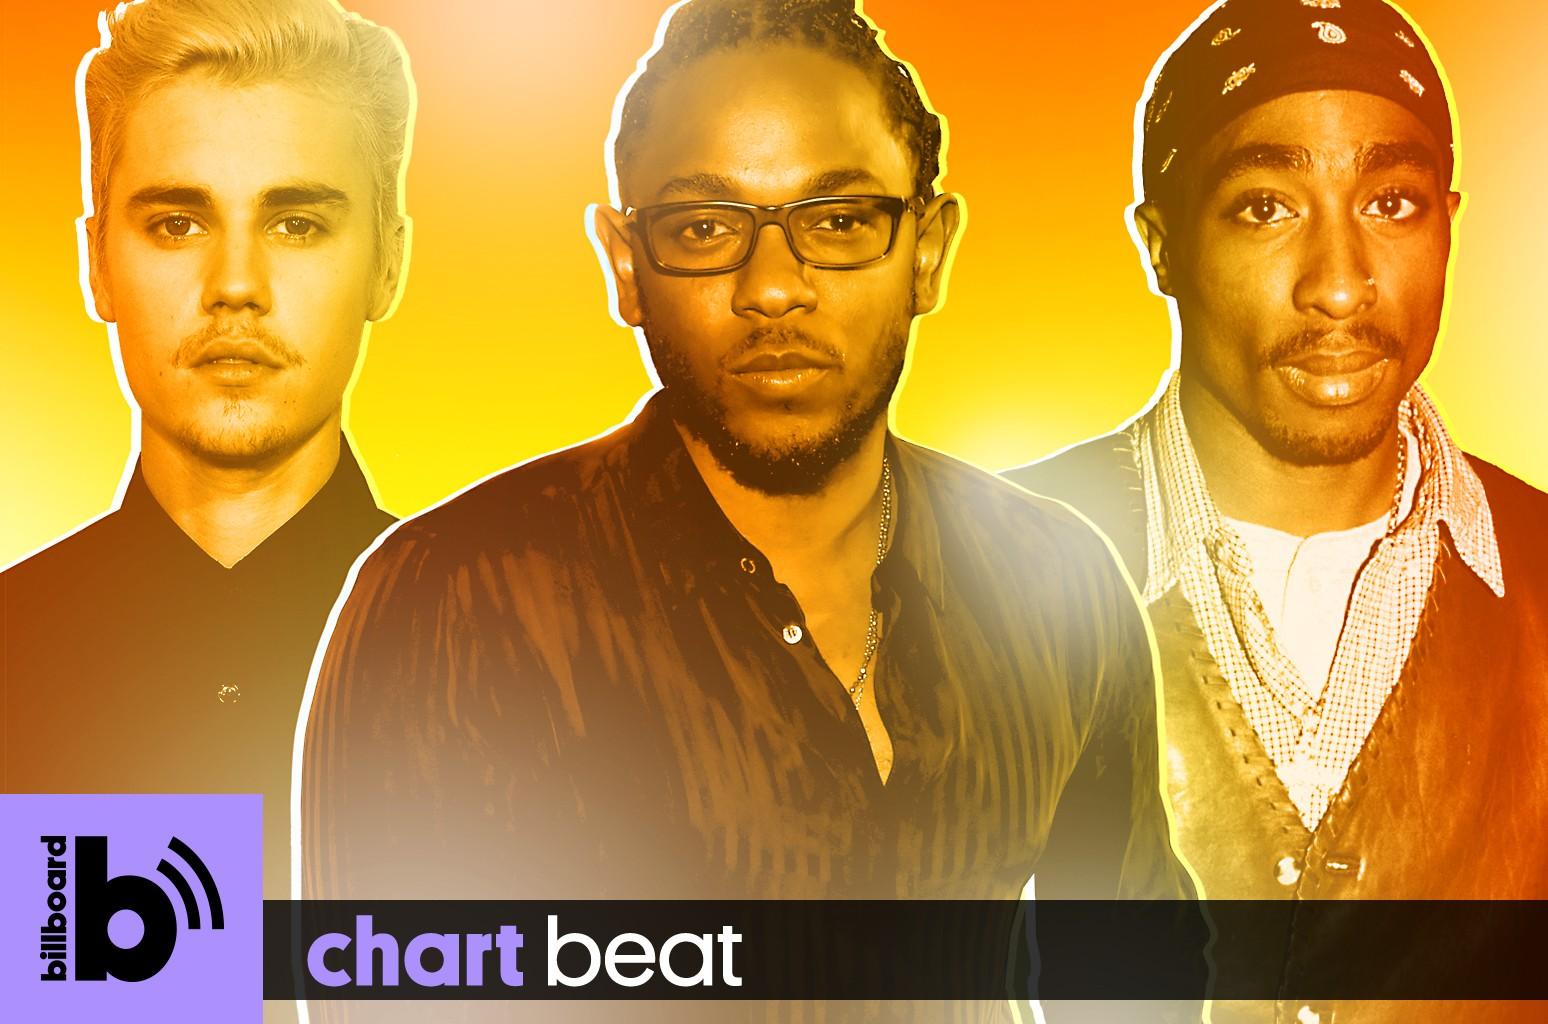 Justin Bieber, Kendrick Lamar & Tupac Shakur